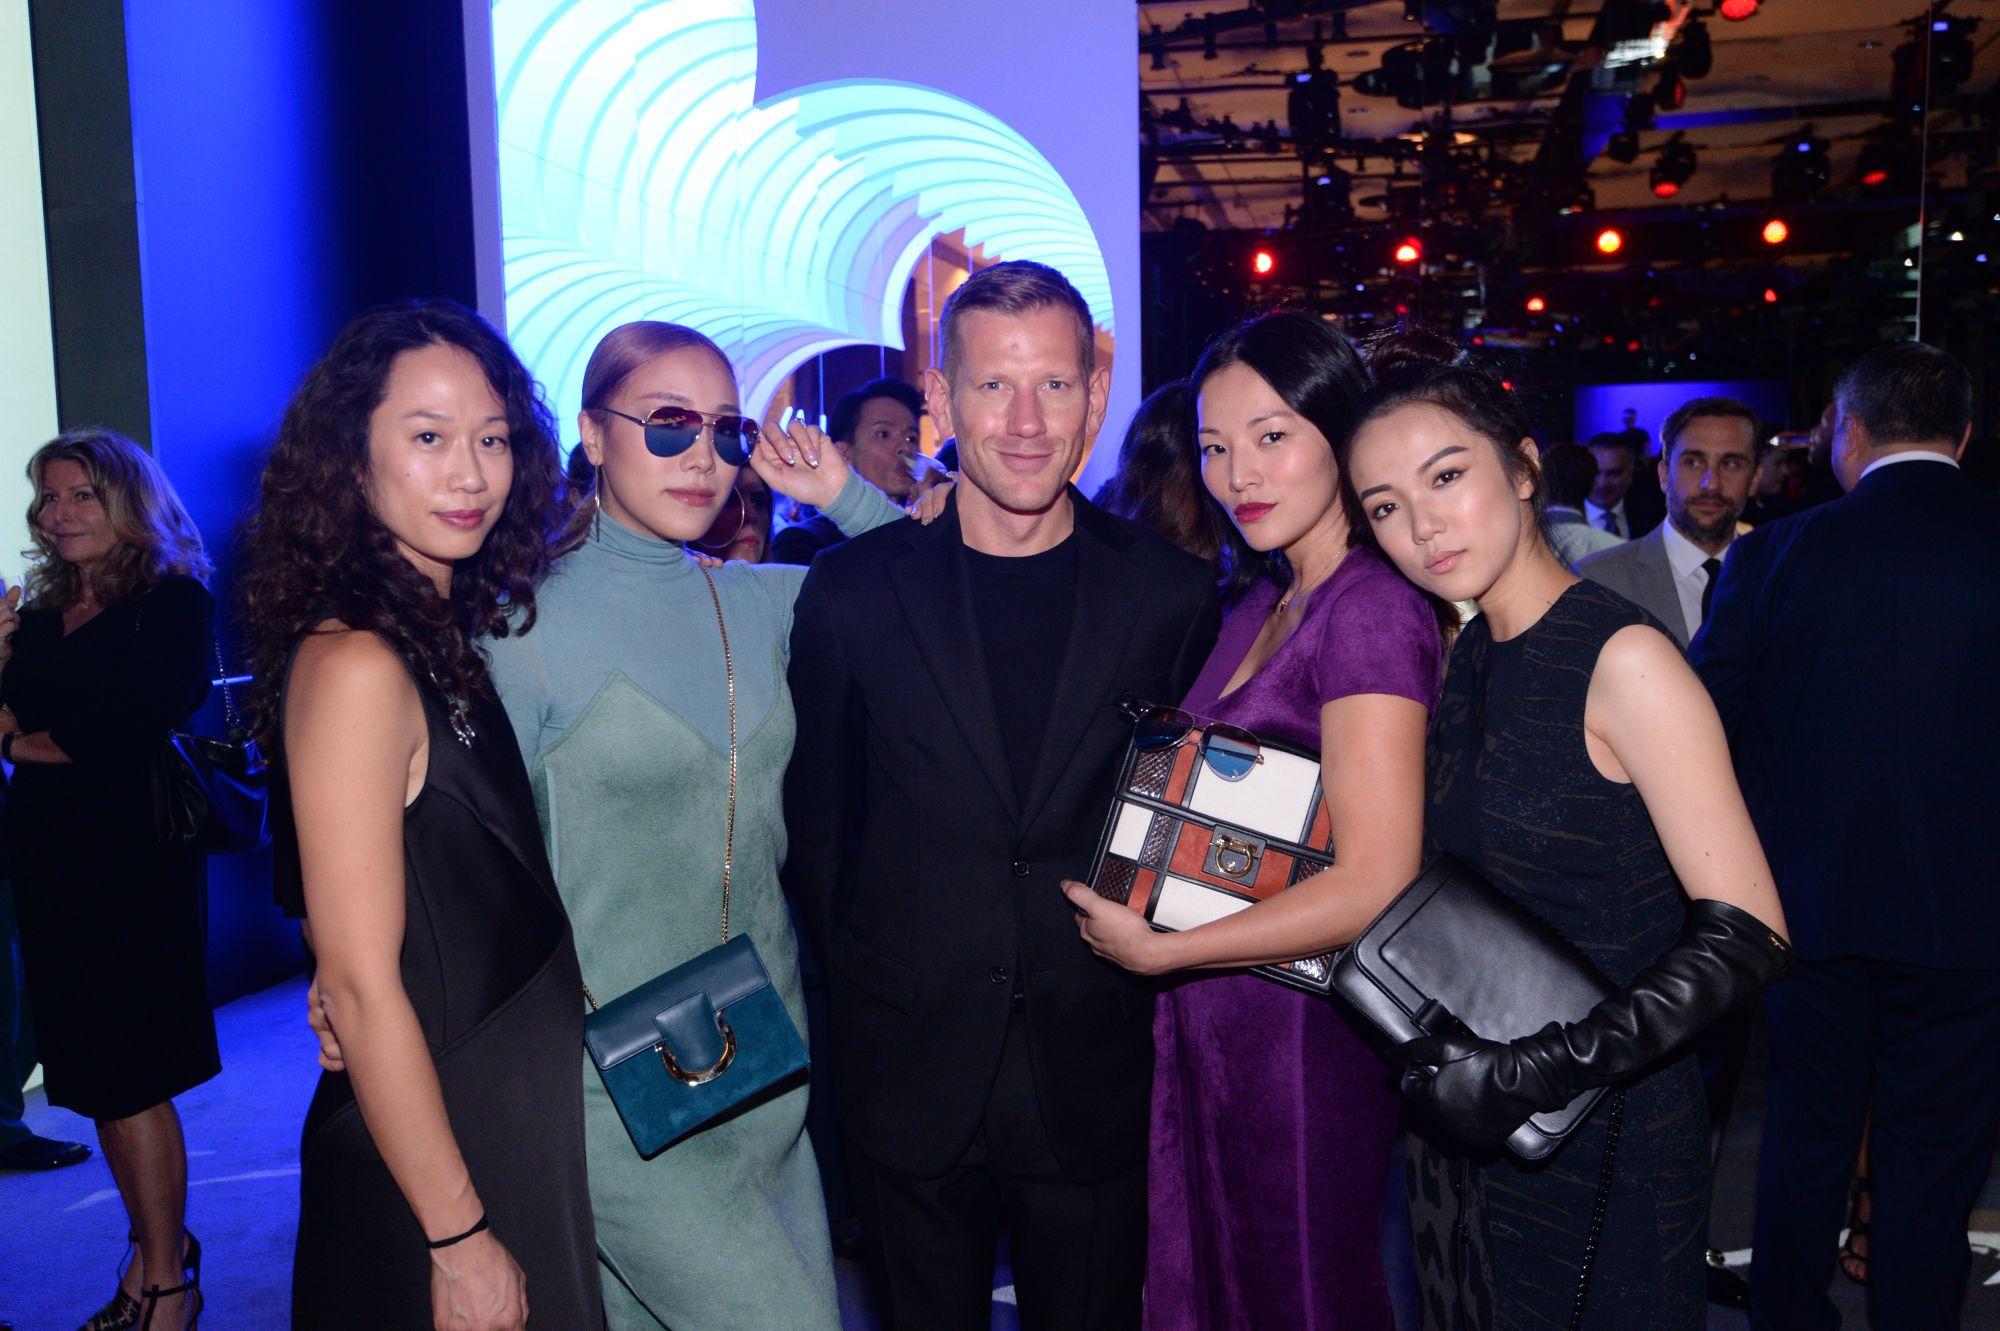 Kim Kollar, Feiping Chang, Paul Andrew, Tina Leung, Yoyo Cao